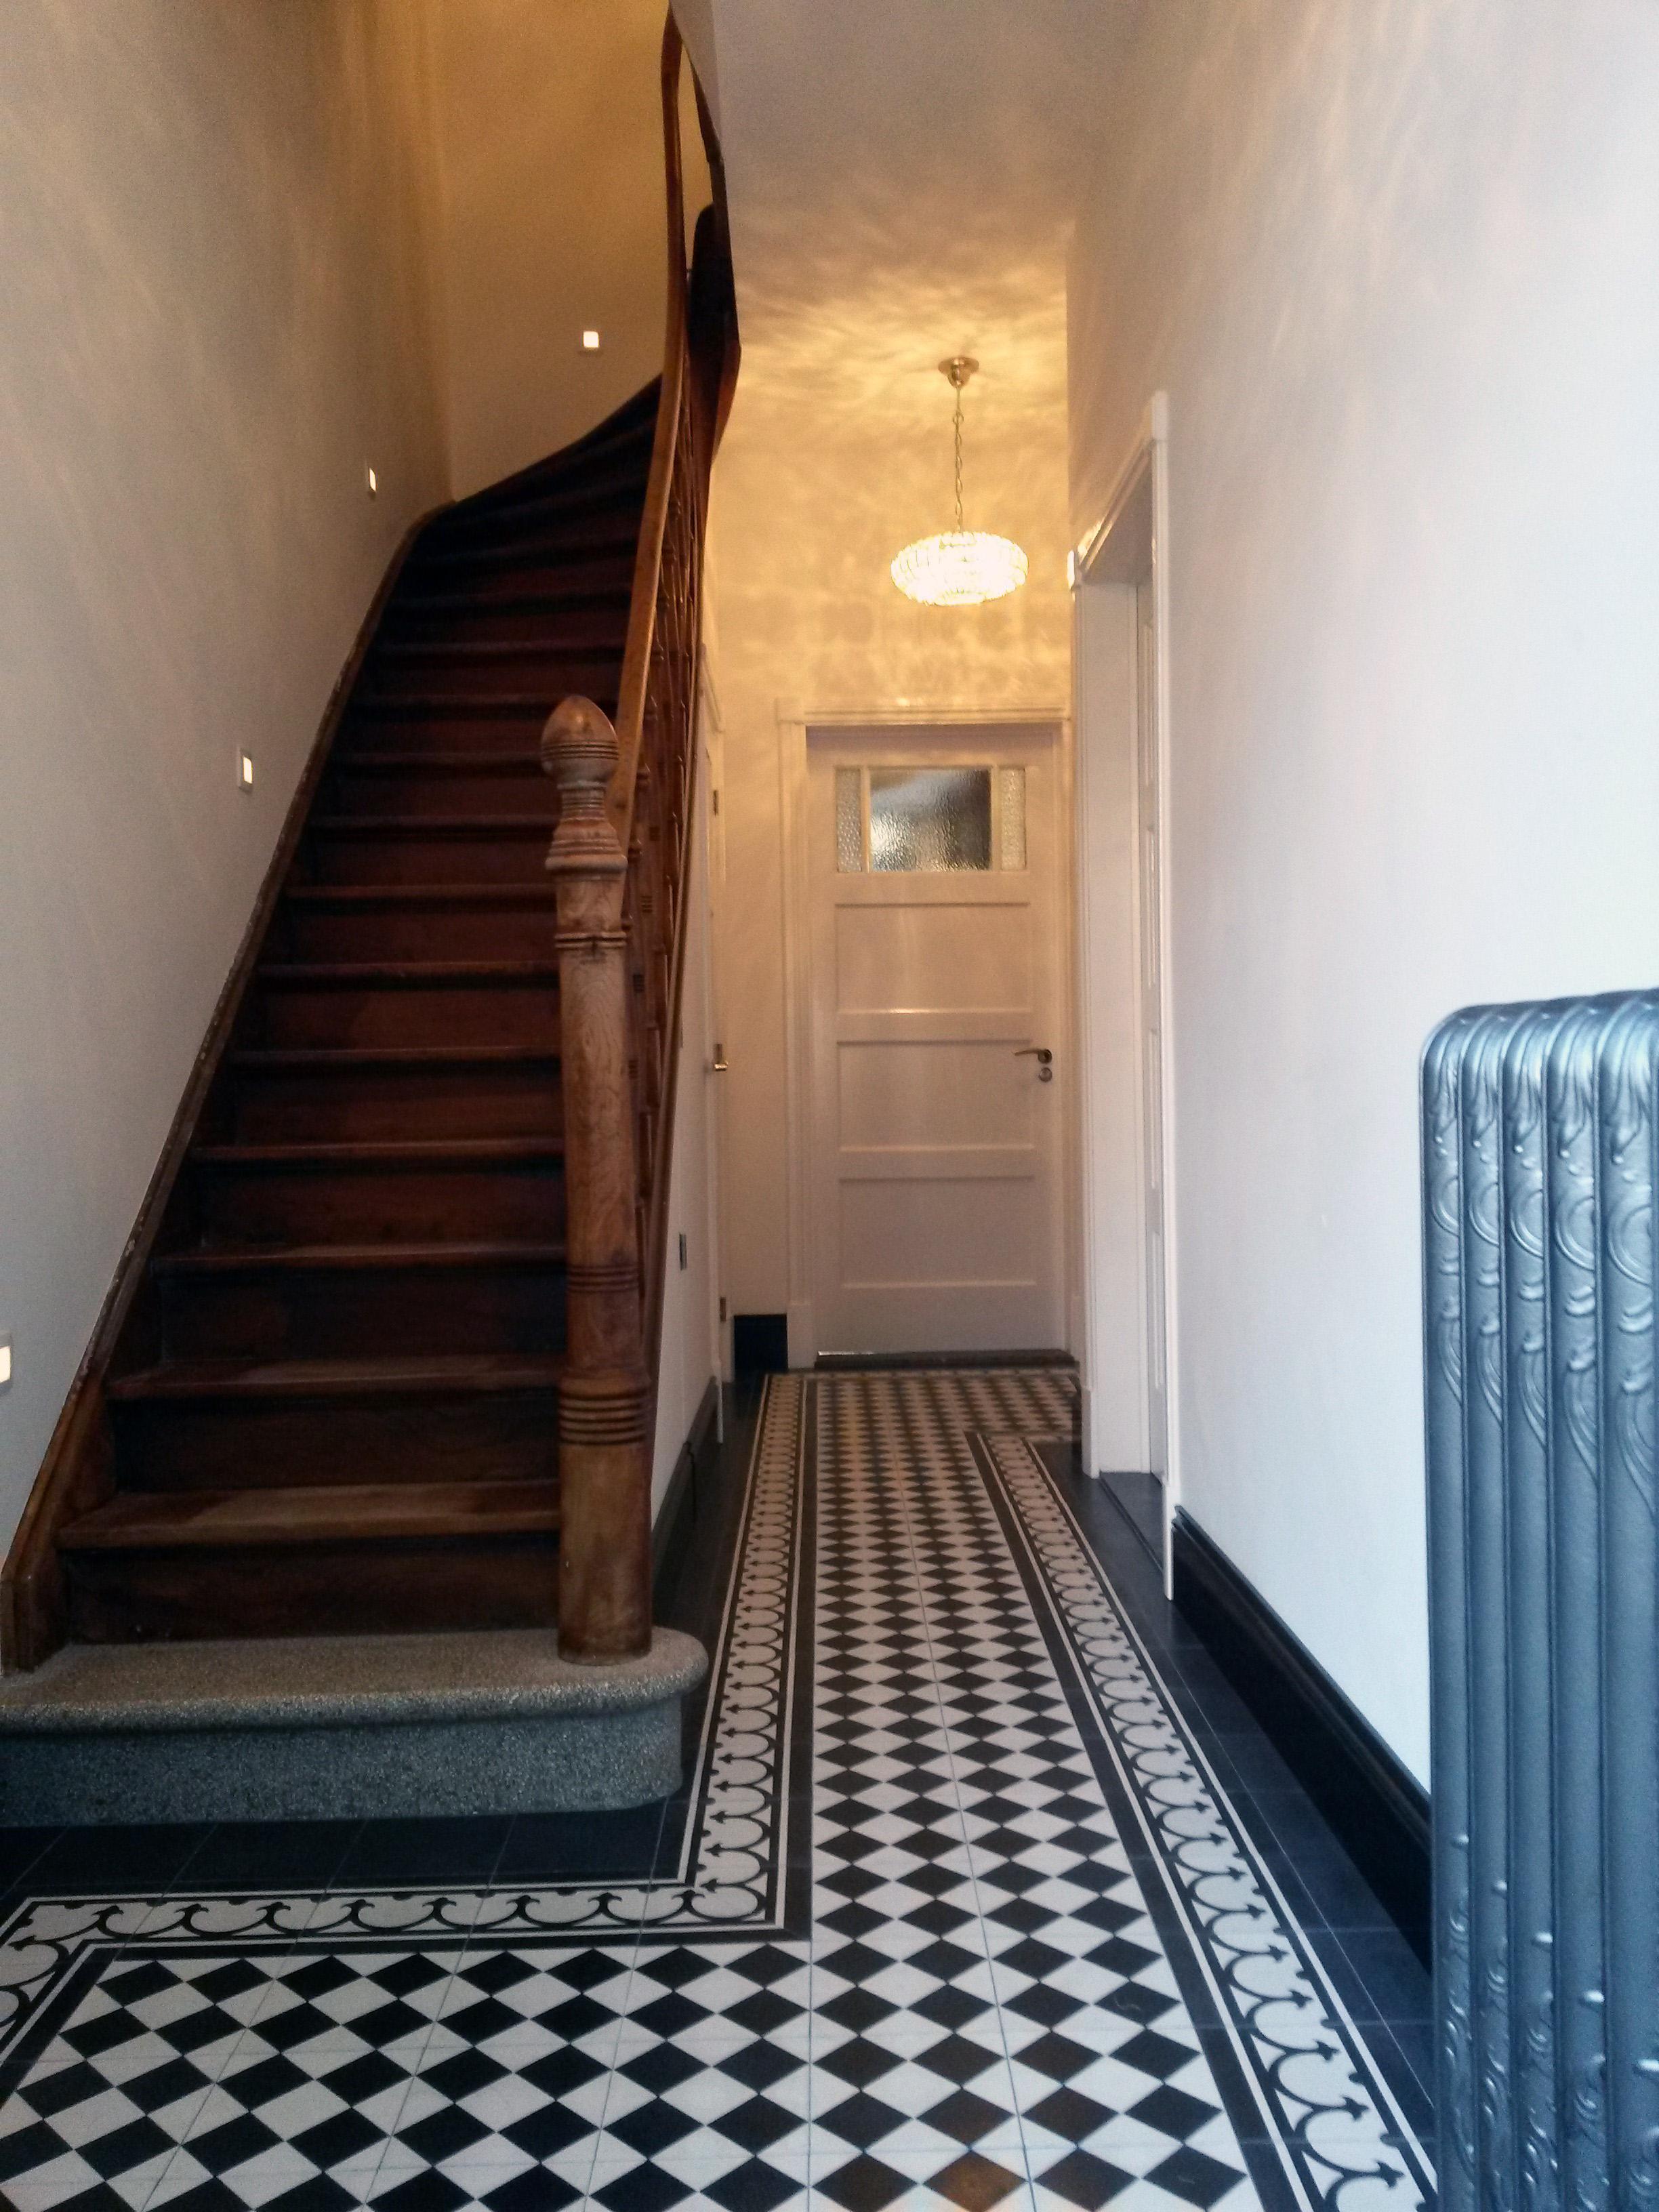 Wycker B&B hallway